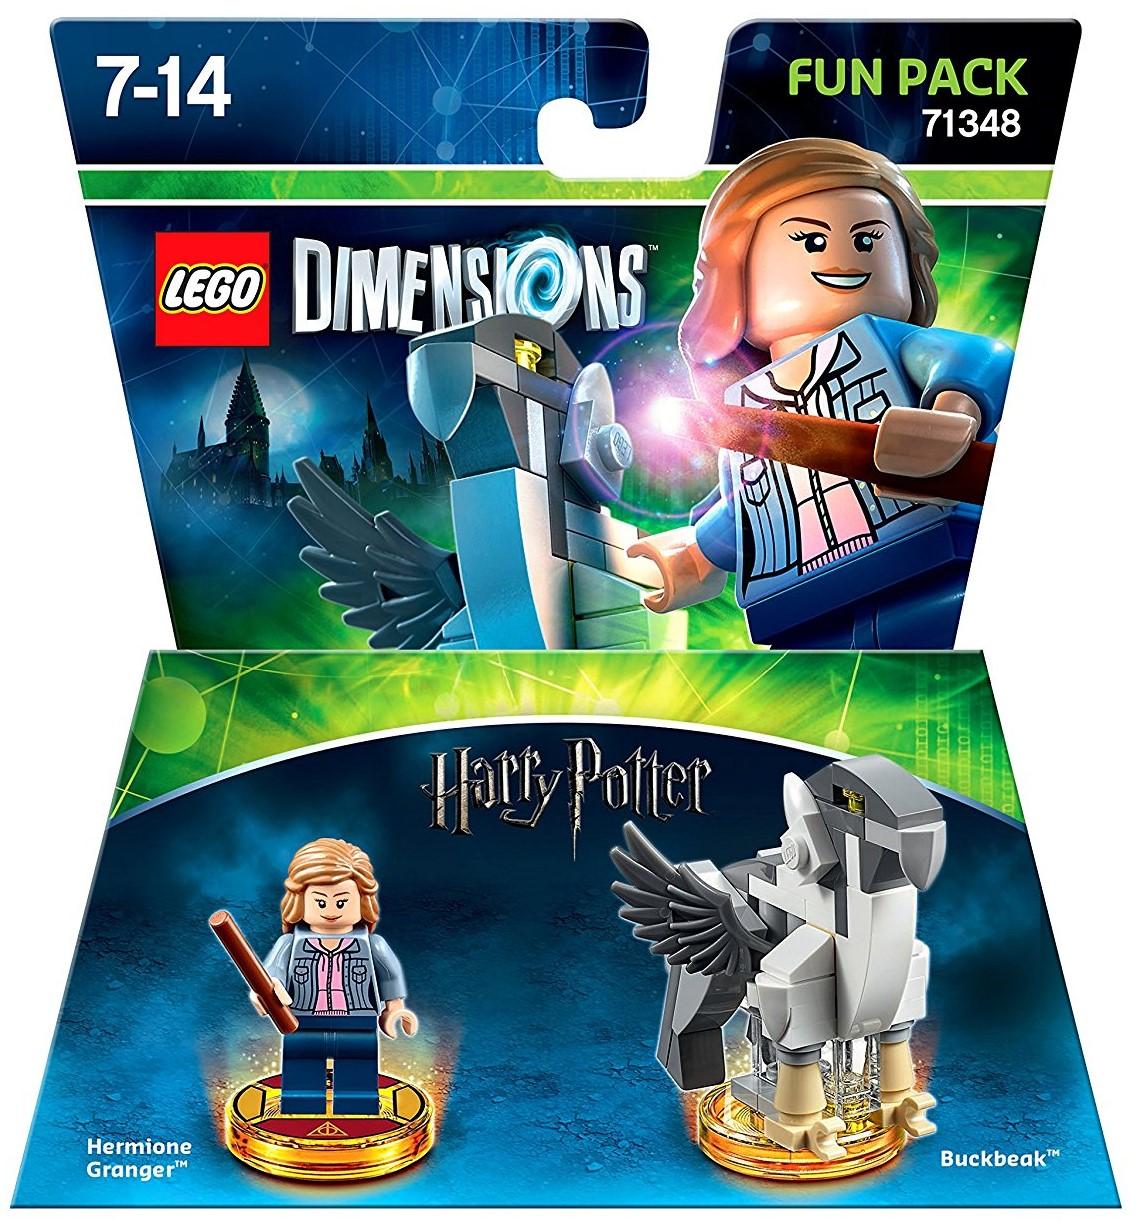 71348 Harry Potter Hermione Granger Fun Pack